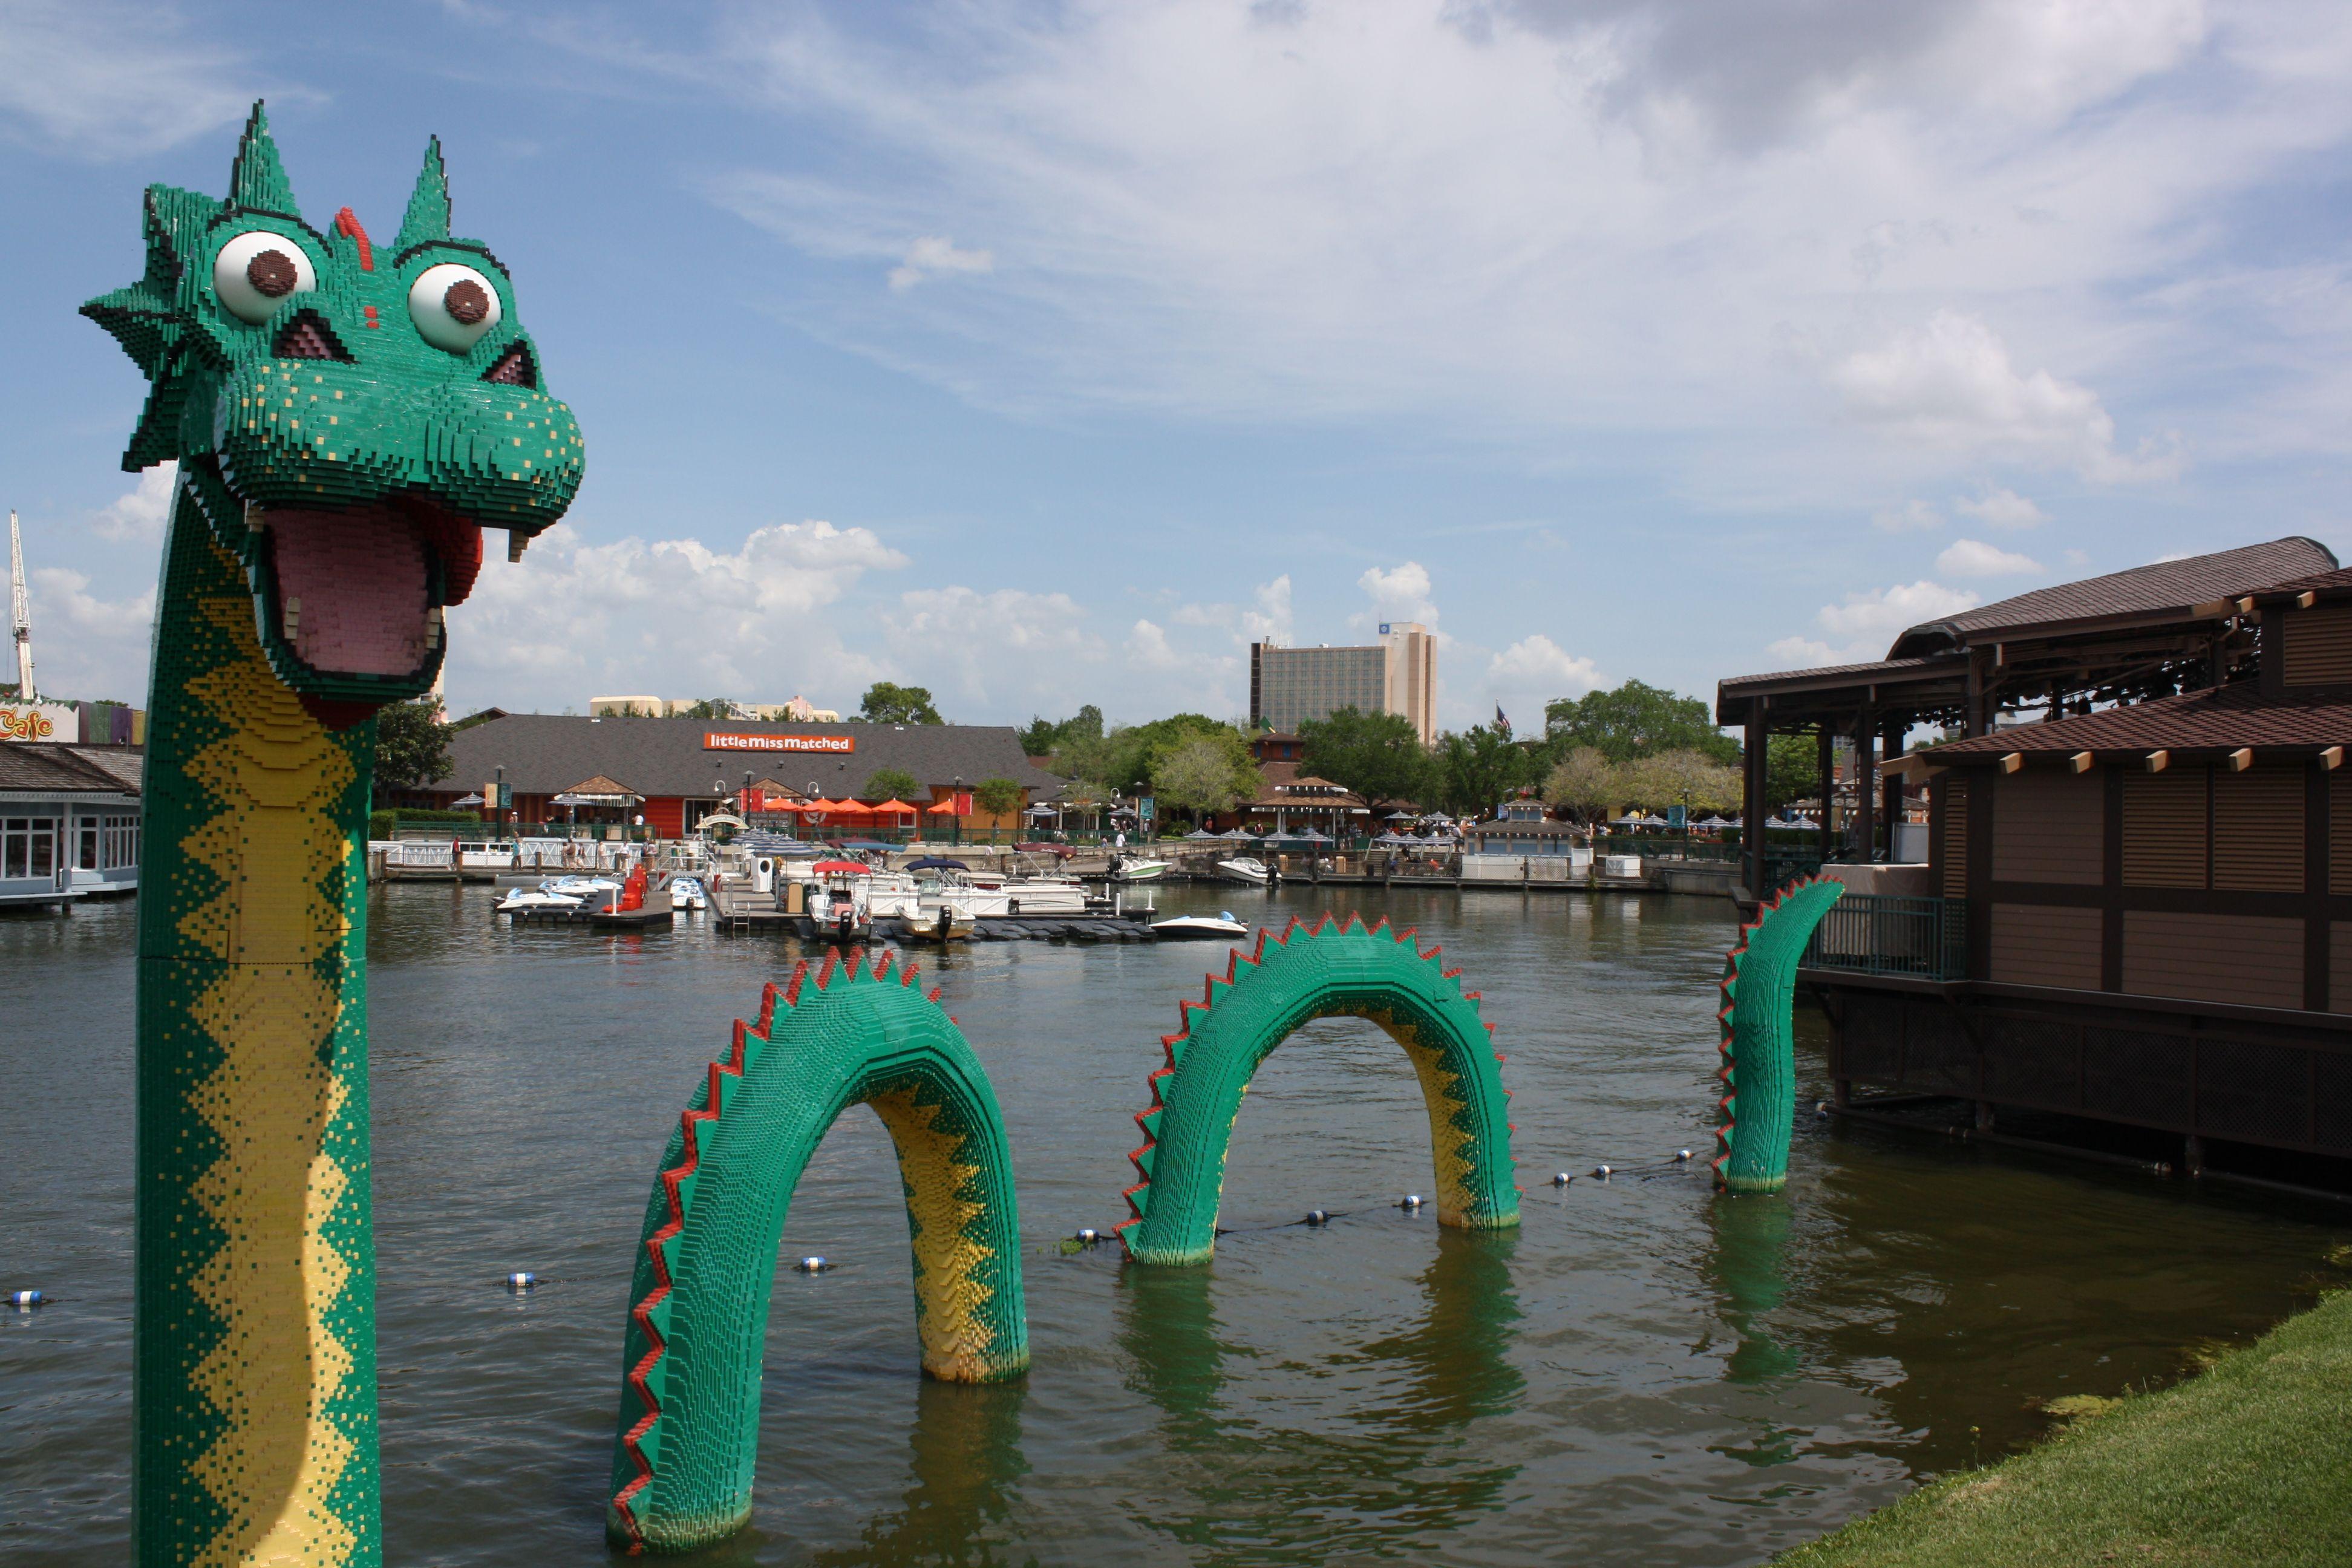 Lego Sea Monster Downtown Disney